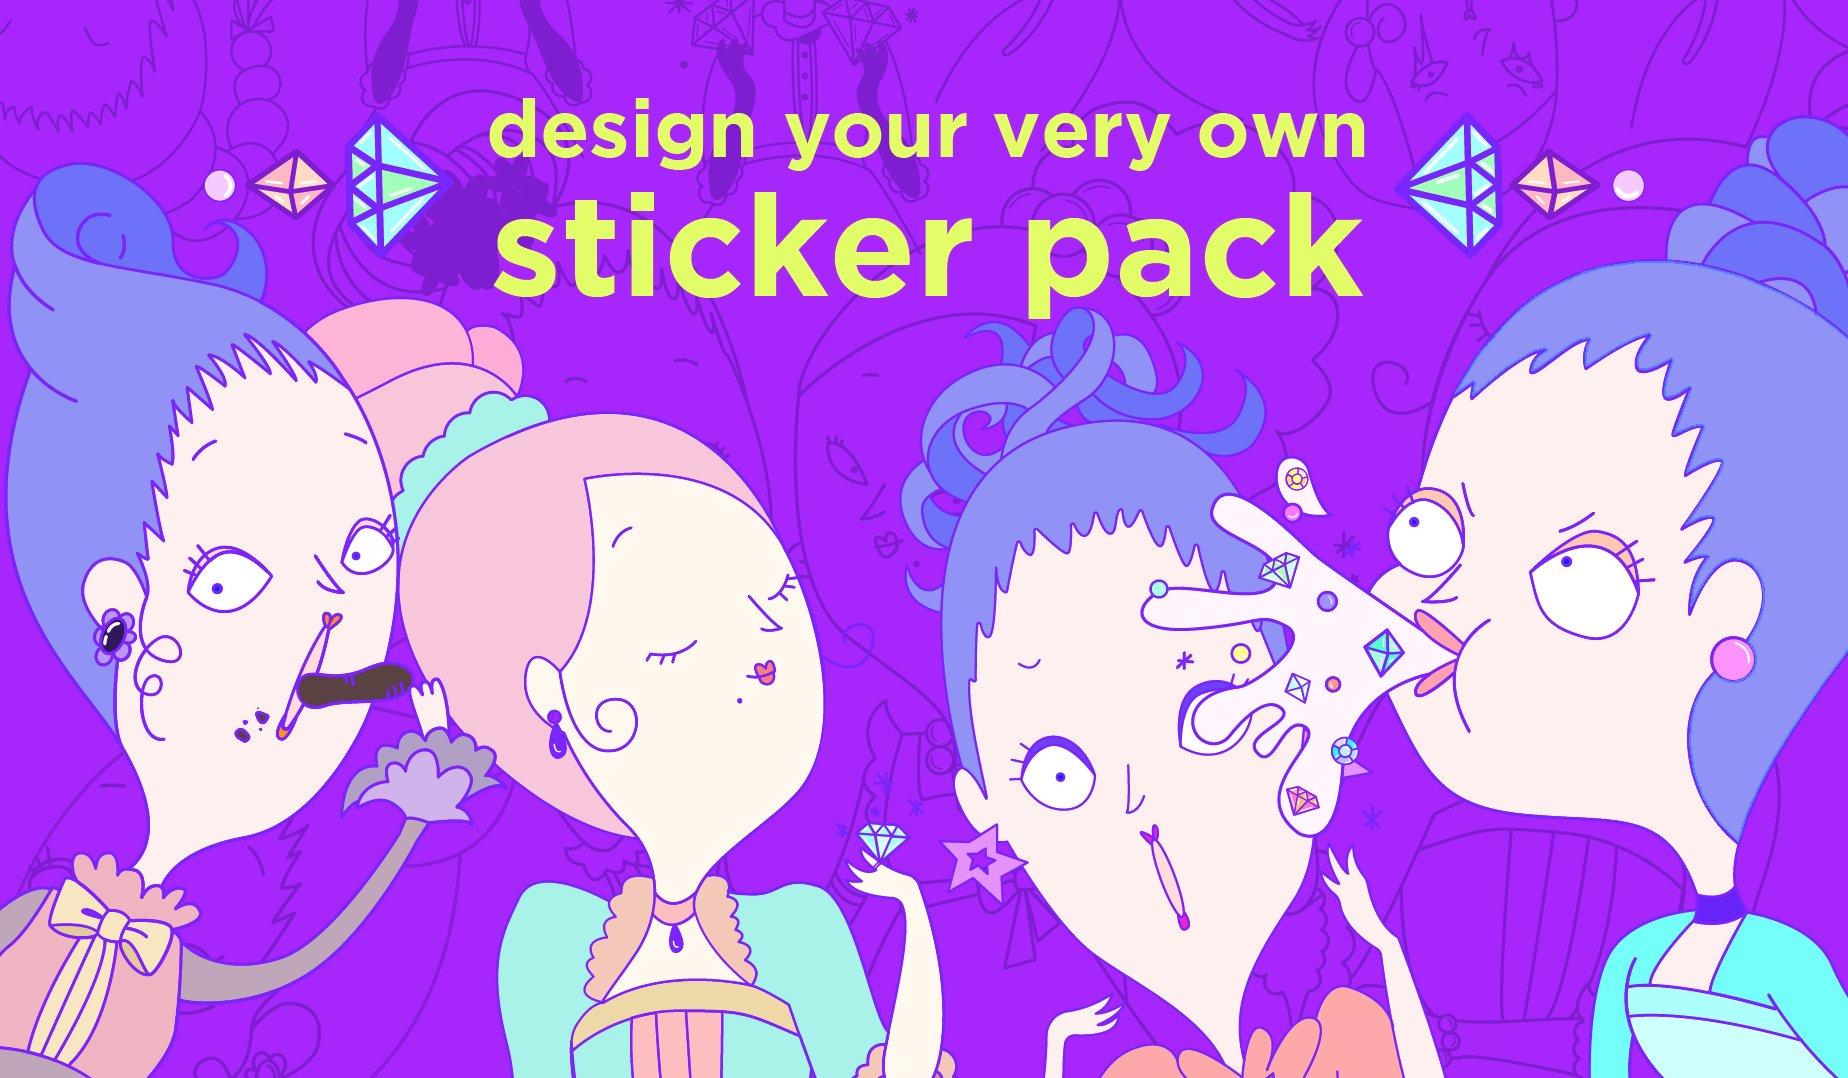 Design Stickers In Adobe Illustrator Amber Lim Skillshare - Design your own stickers